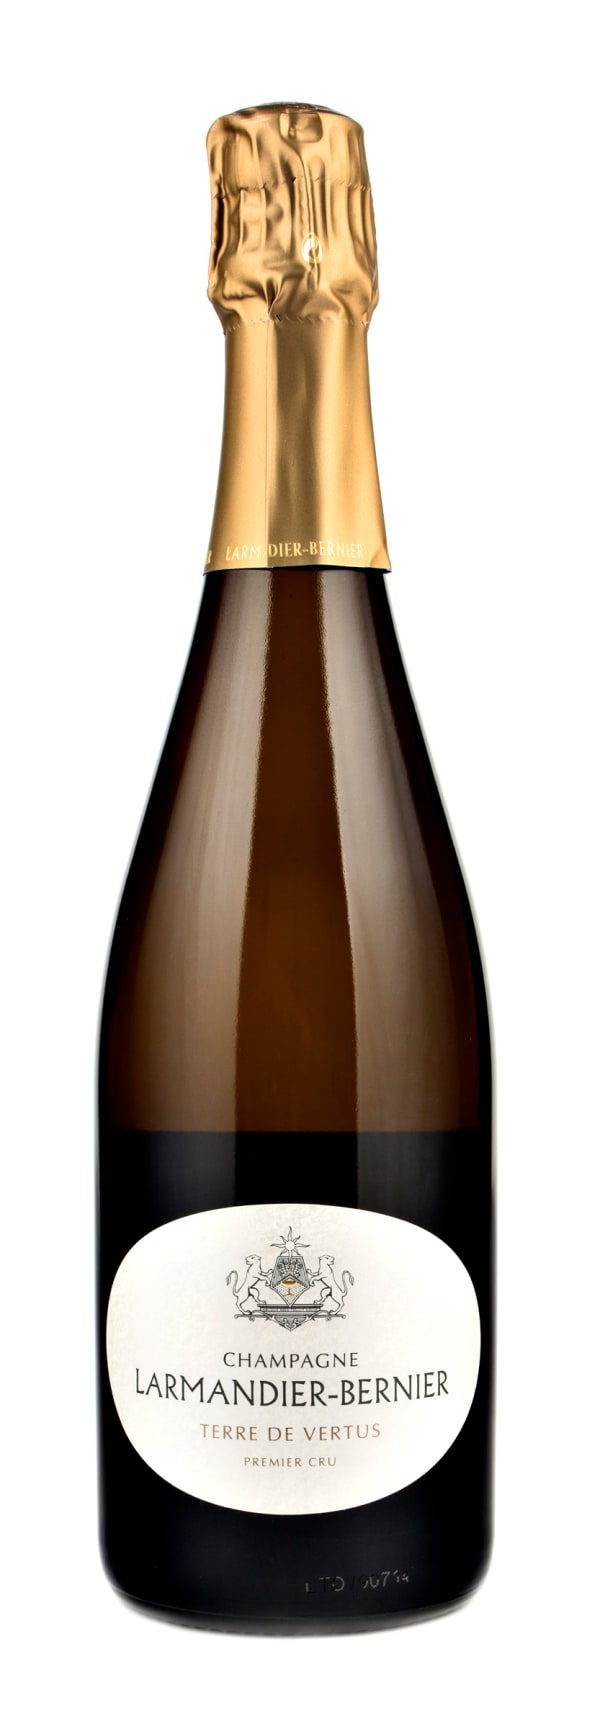 Larmandier-Bernier Terre de Vertus Premier Cru Champagne Brut 2011